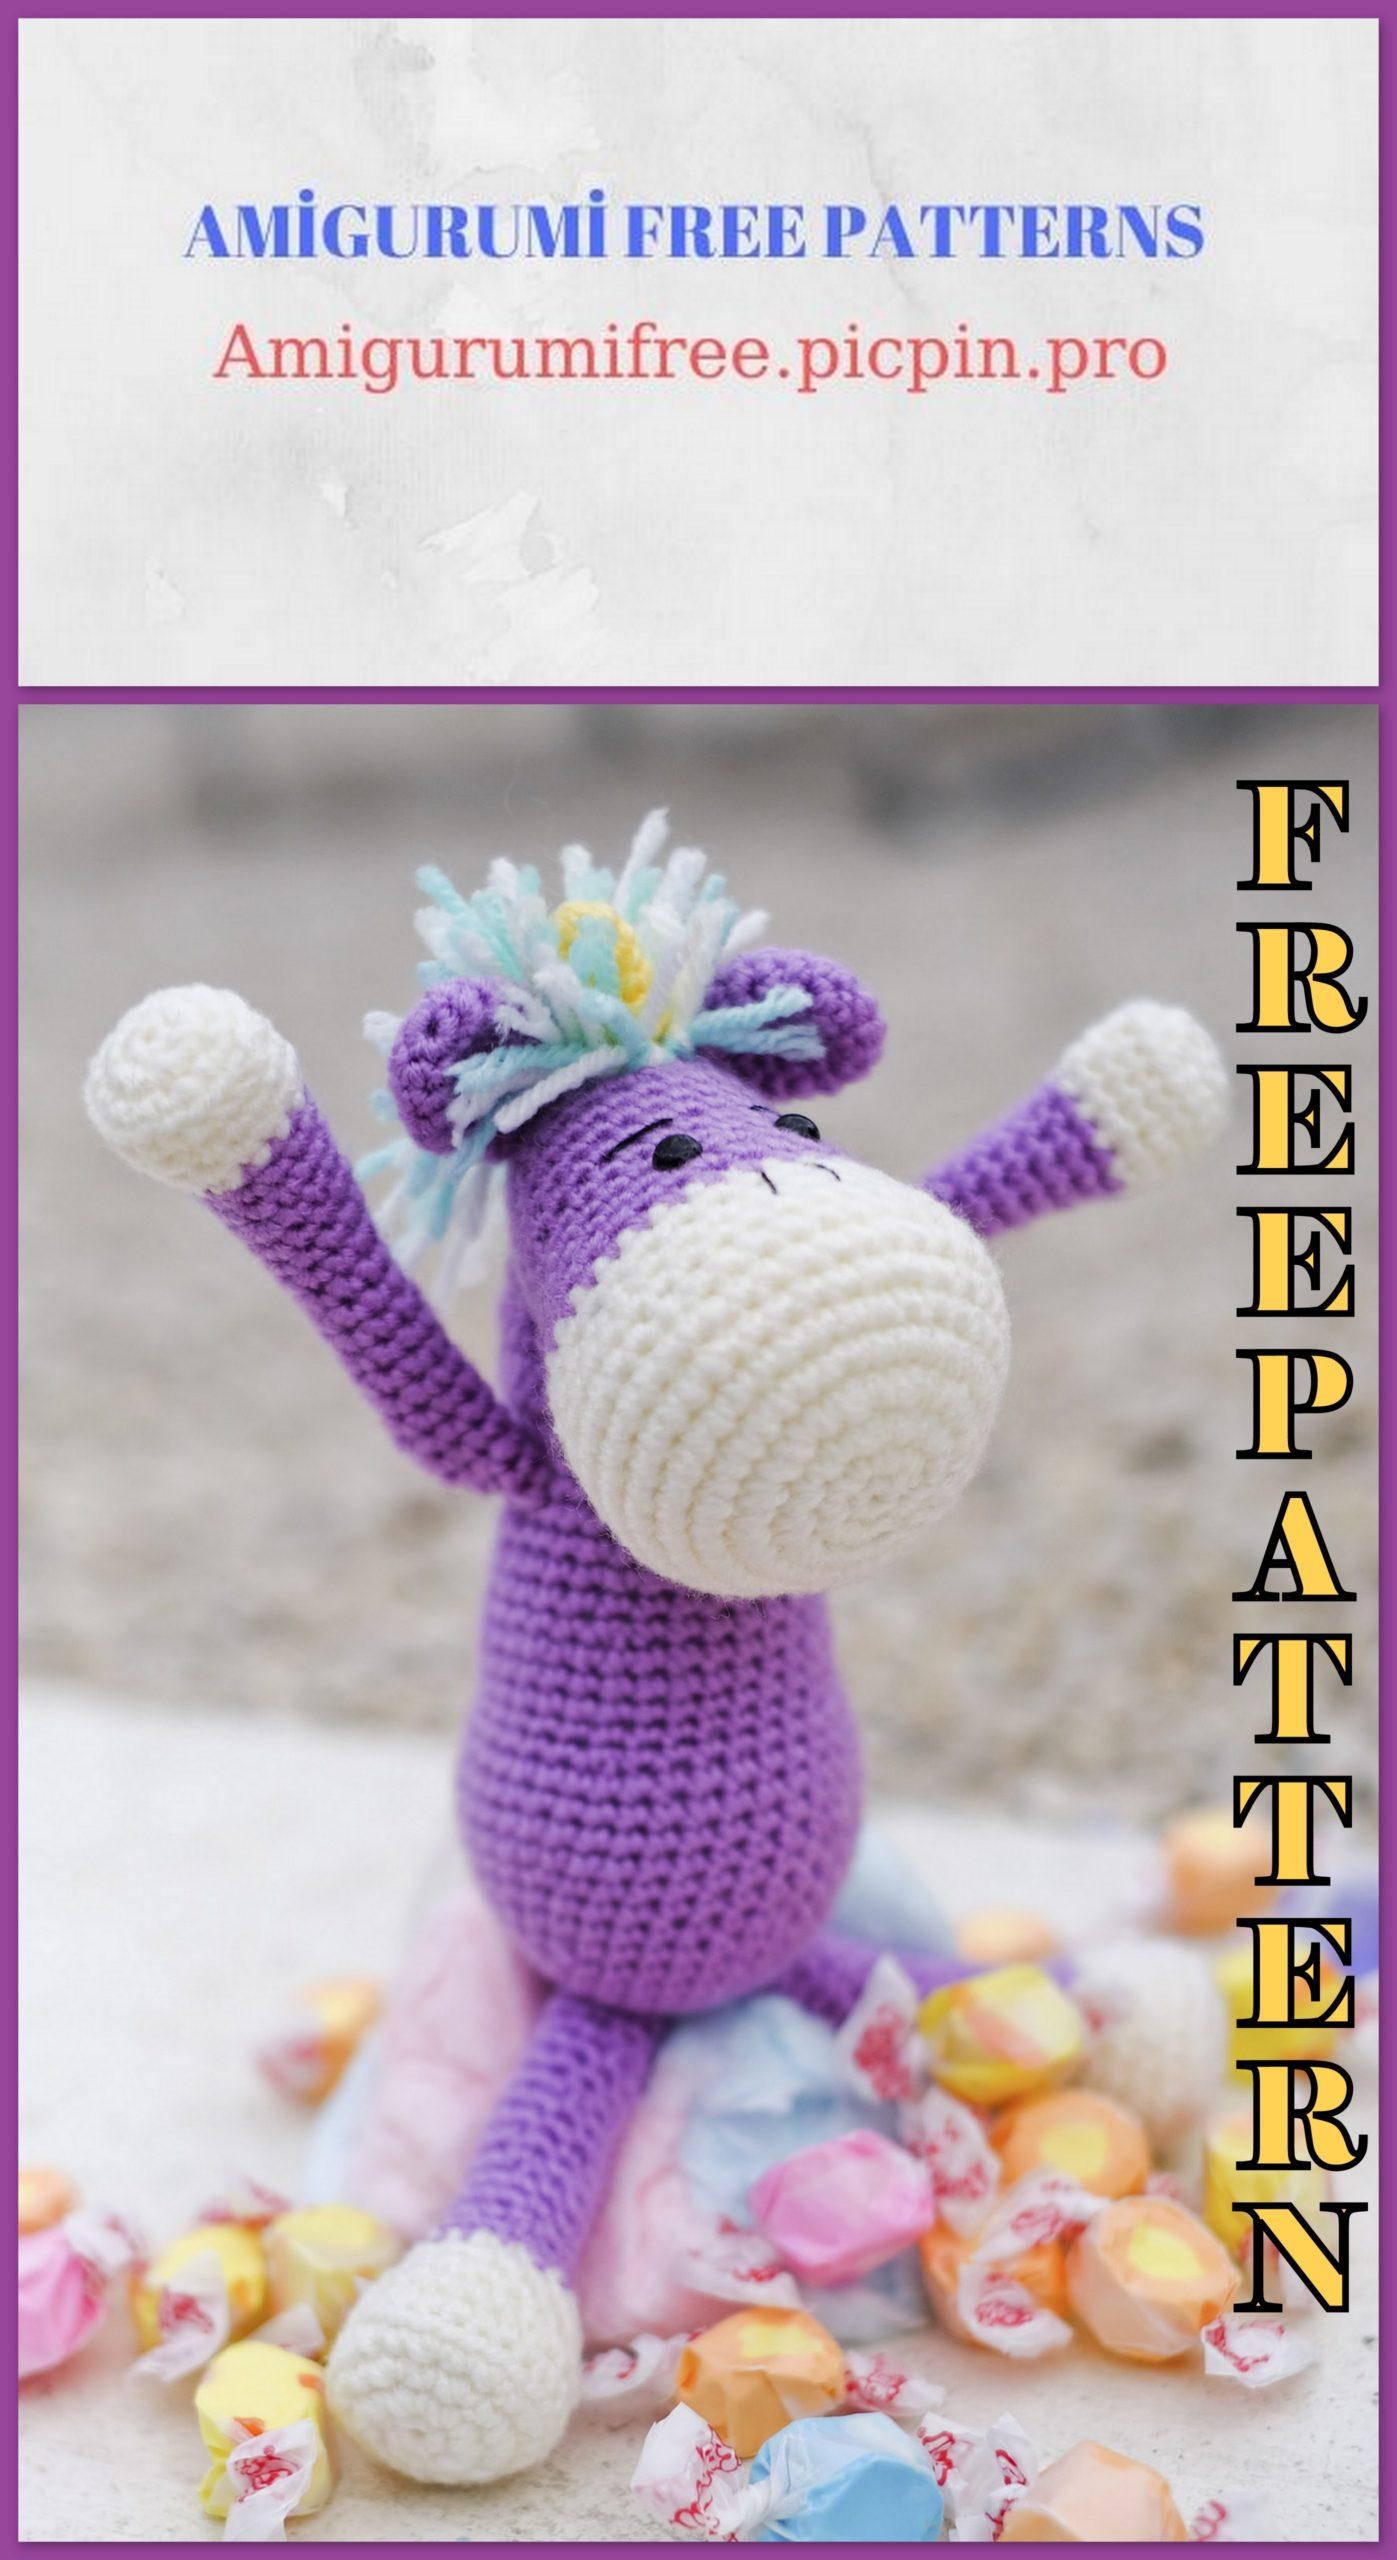 Meet Genghis | Crochet amigurumi free, Crochet amigurumi free ... | 2560x1397